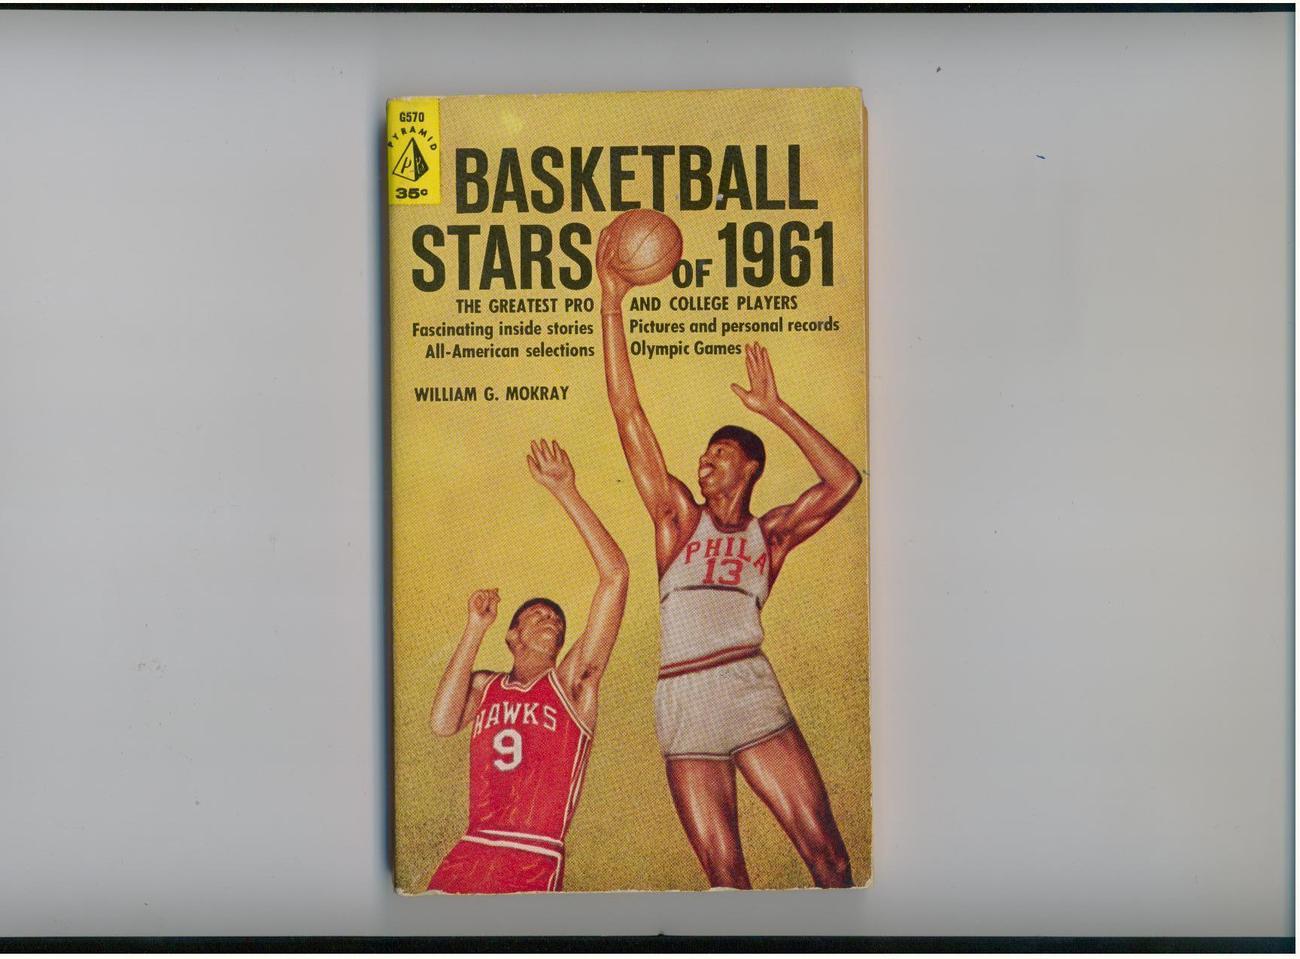 BASKETBALL STARS OF 1961 - pro/college  - SCARCE 1st